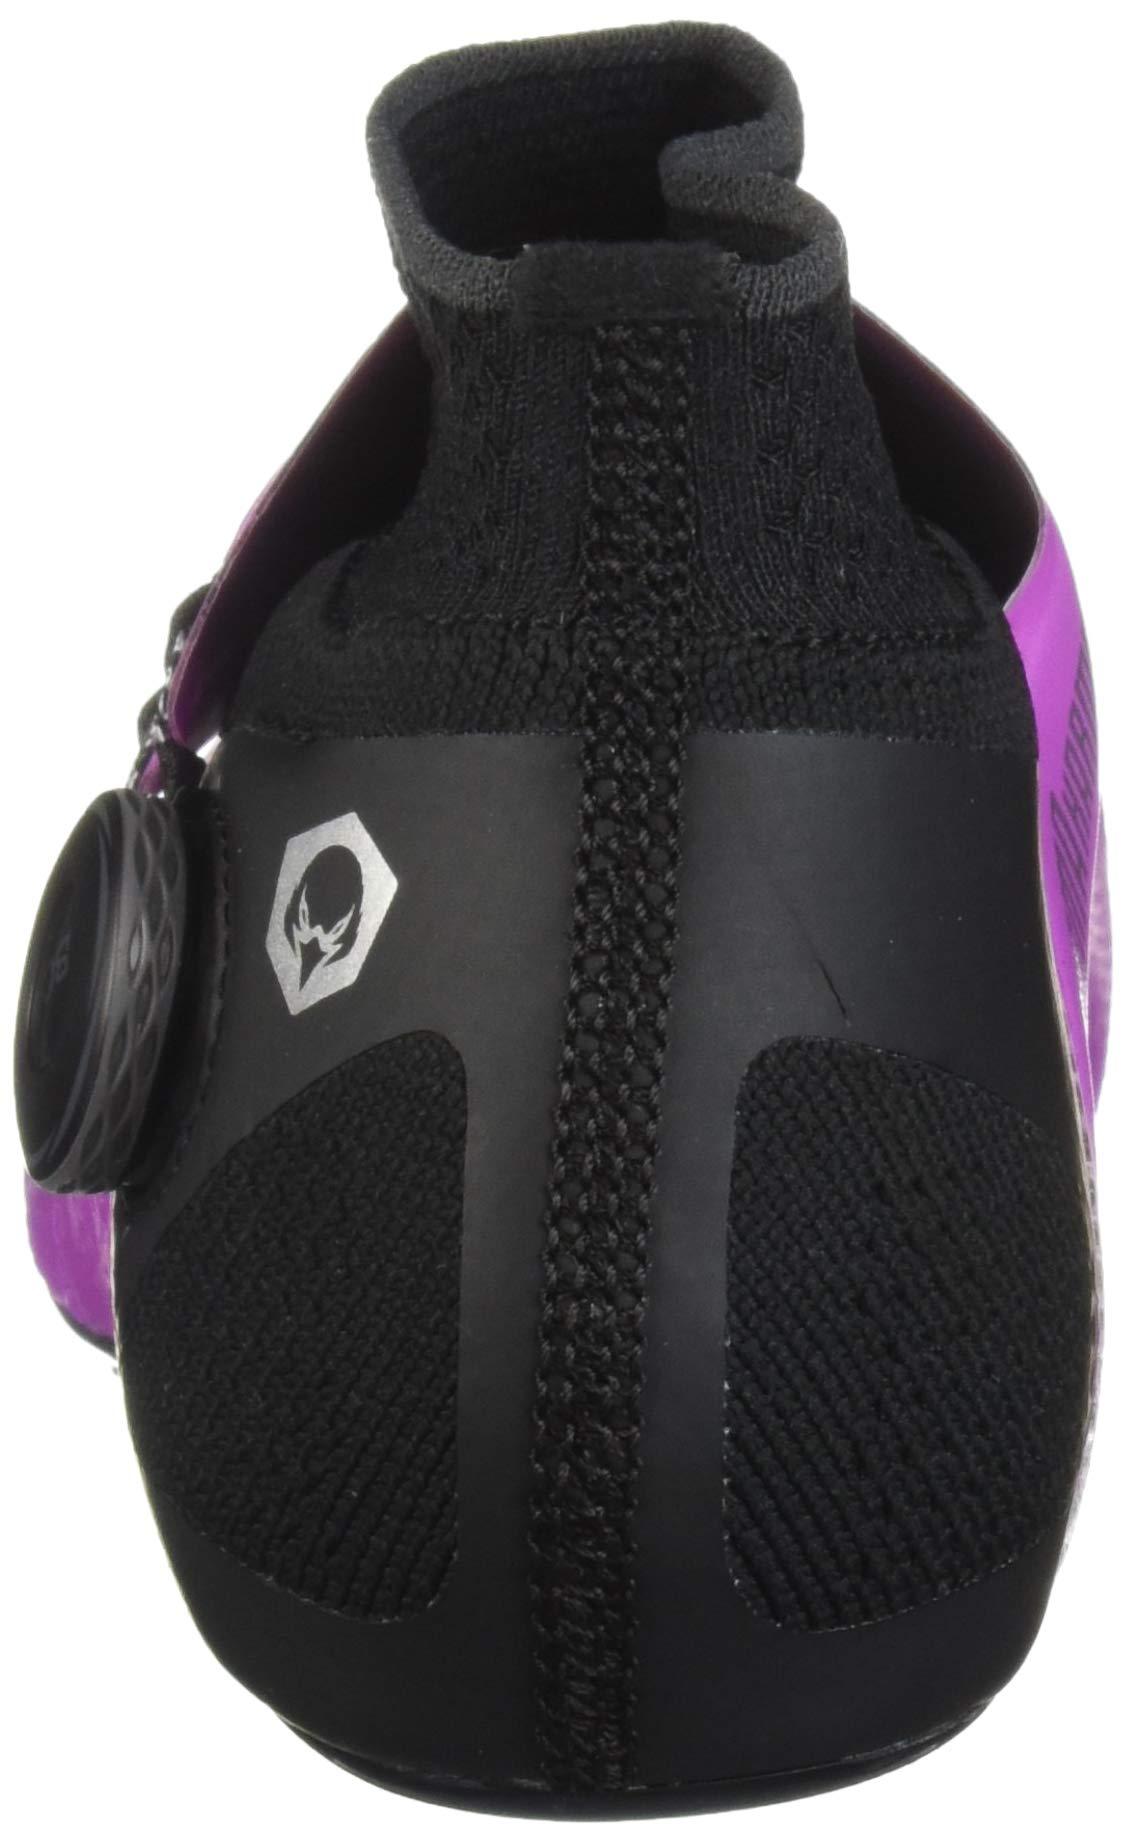 New Balance Men's Sigma Harmony Vazee Track Shoe Voltage Violet/Black 4.5 D US by New Balance (Image #2)